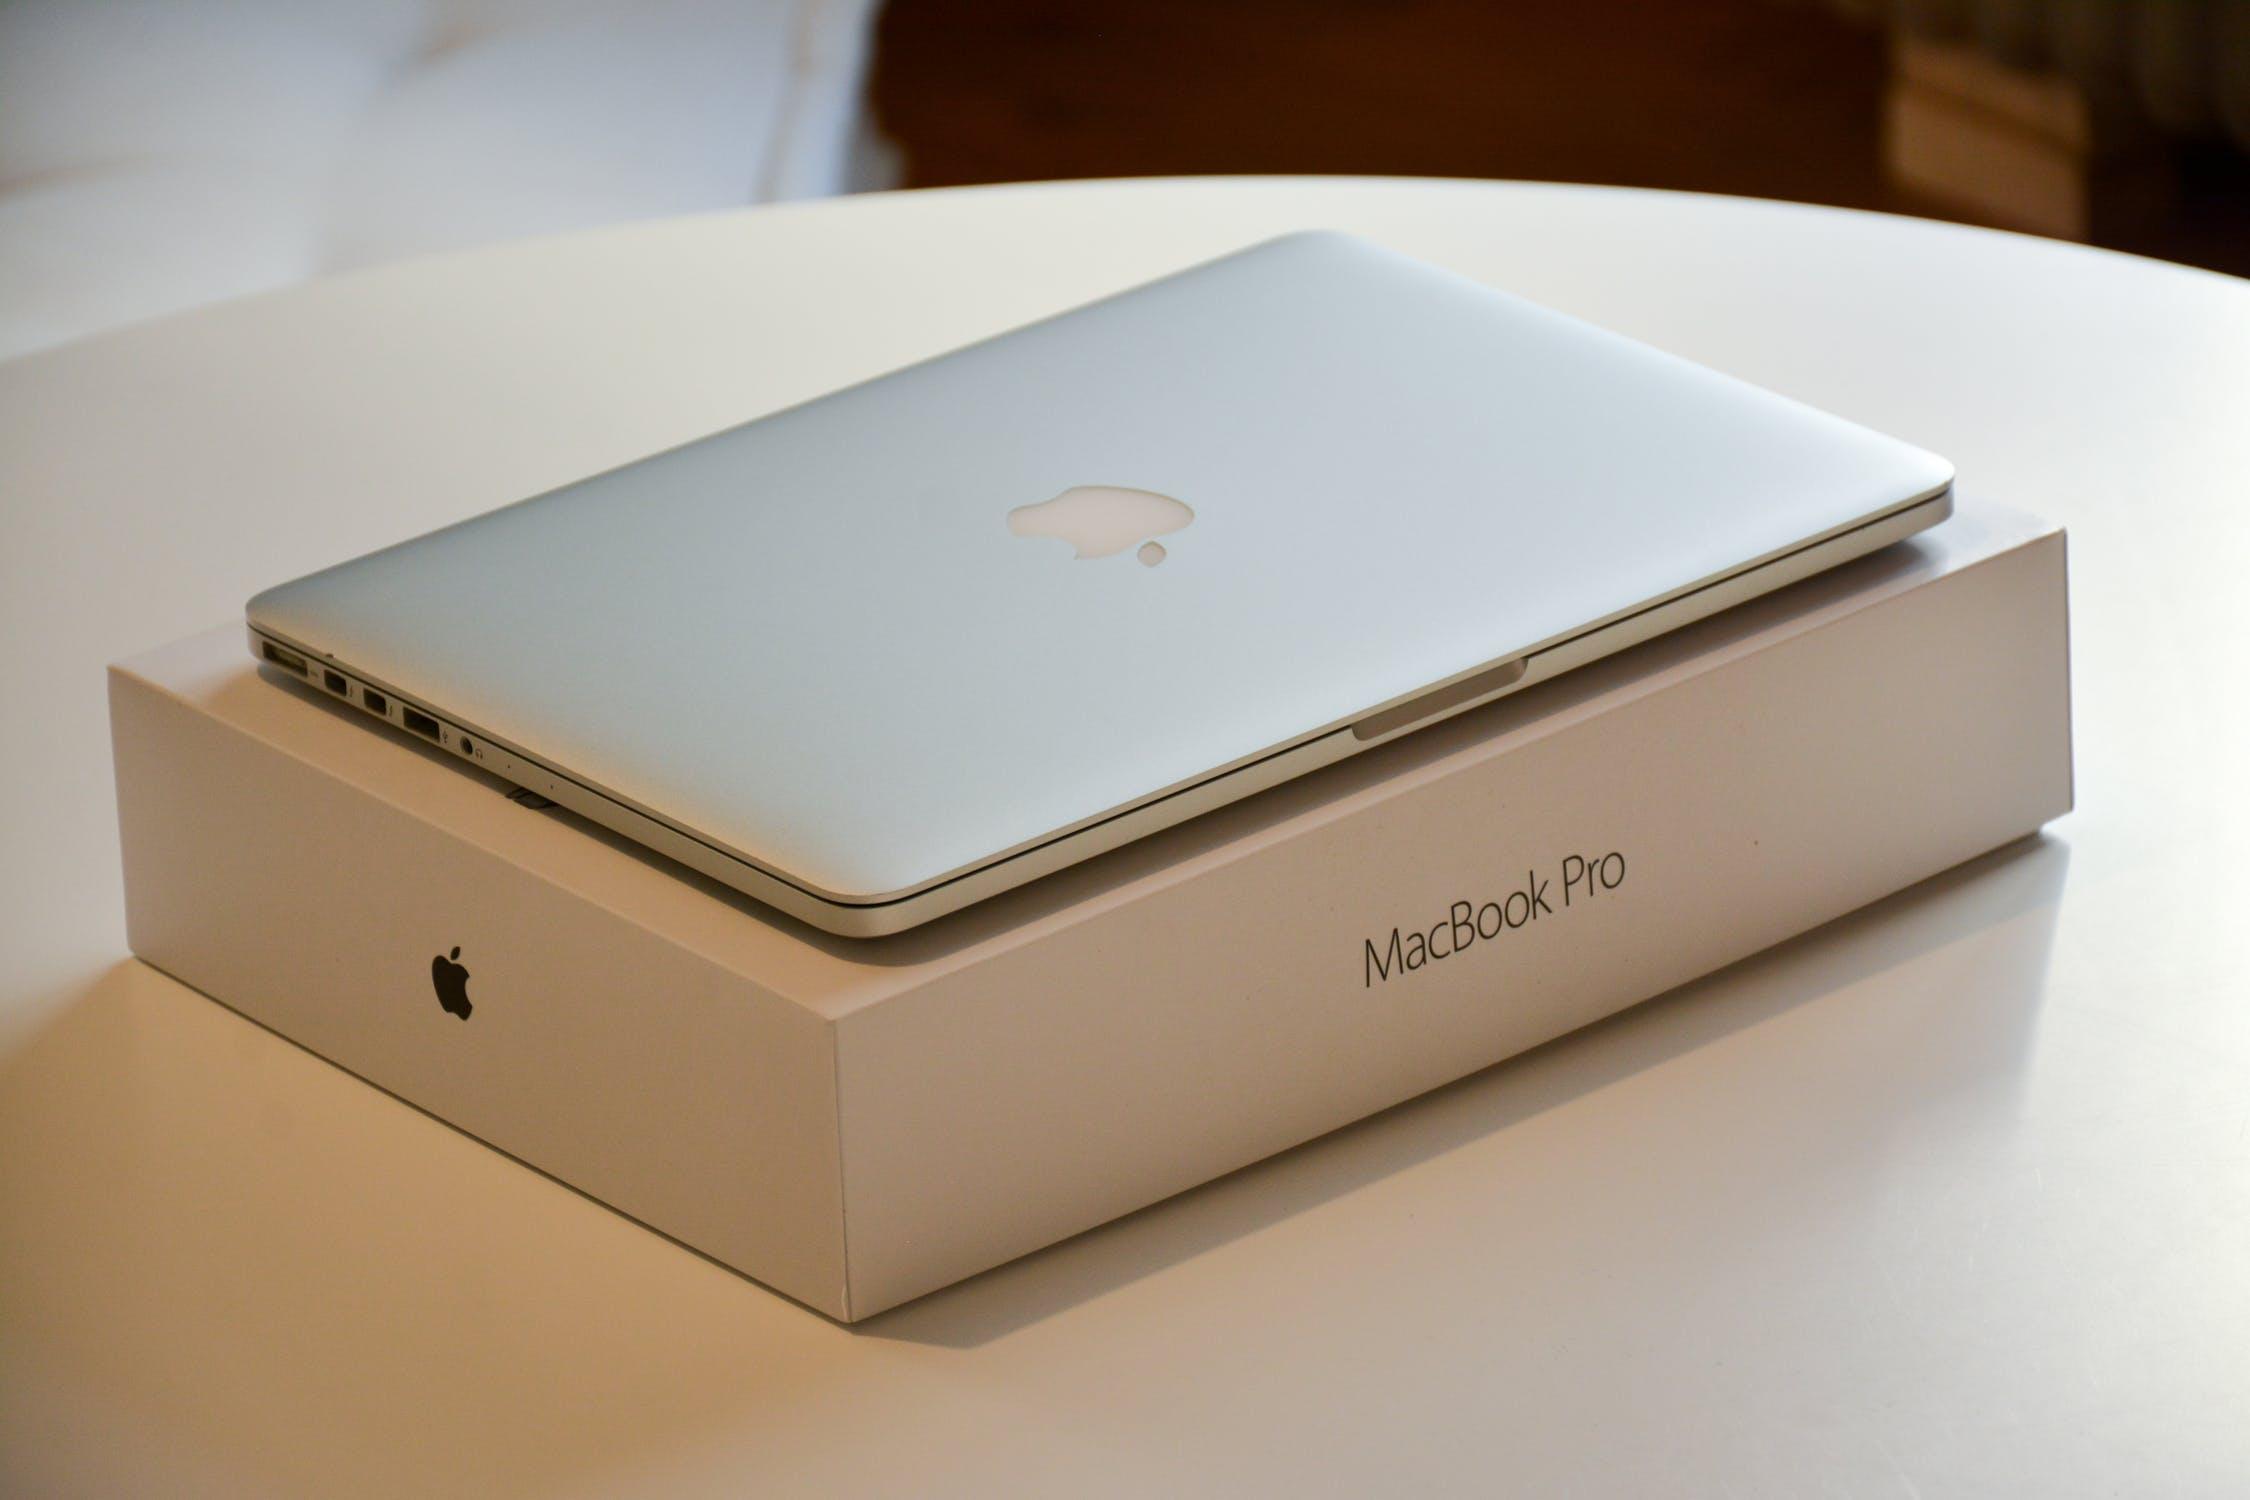 Обзор нового Apple MacBook Pro 15 2018 - Макбук на коробке